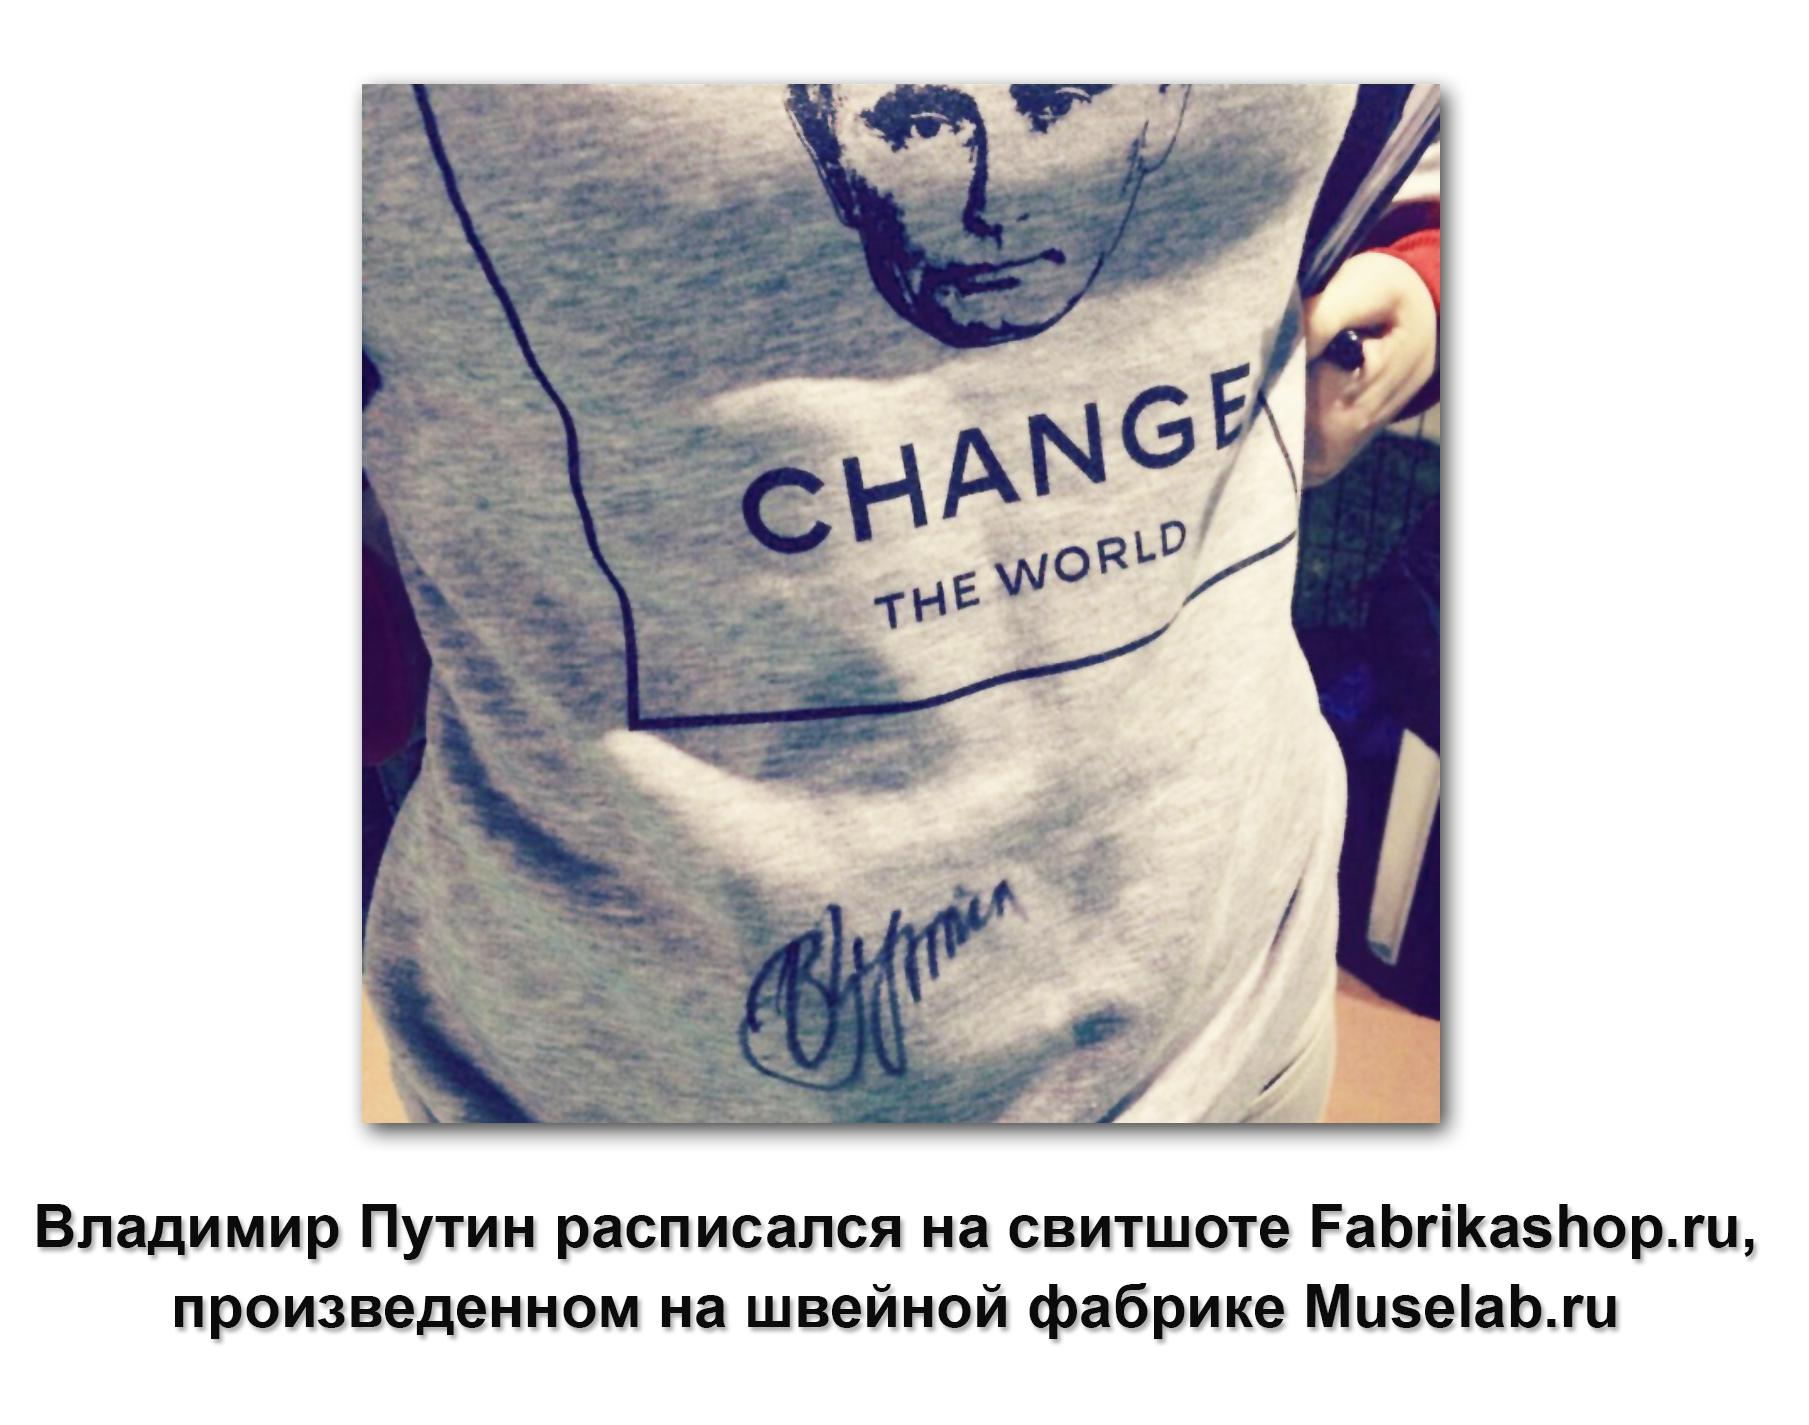 Подпись путина на свитшоте производства Muselab.ru